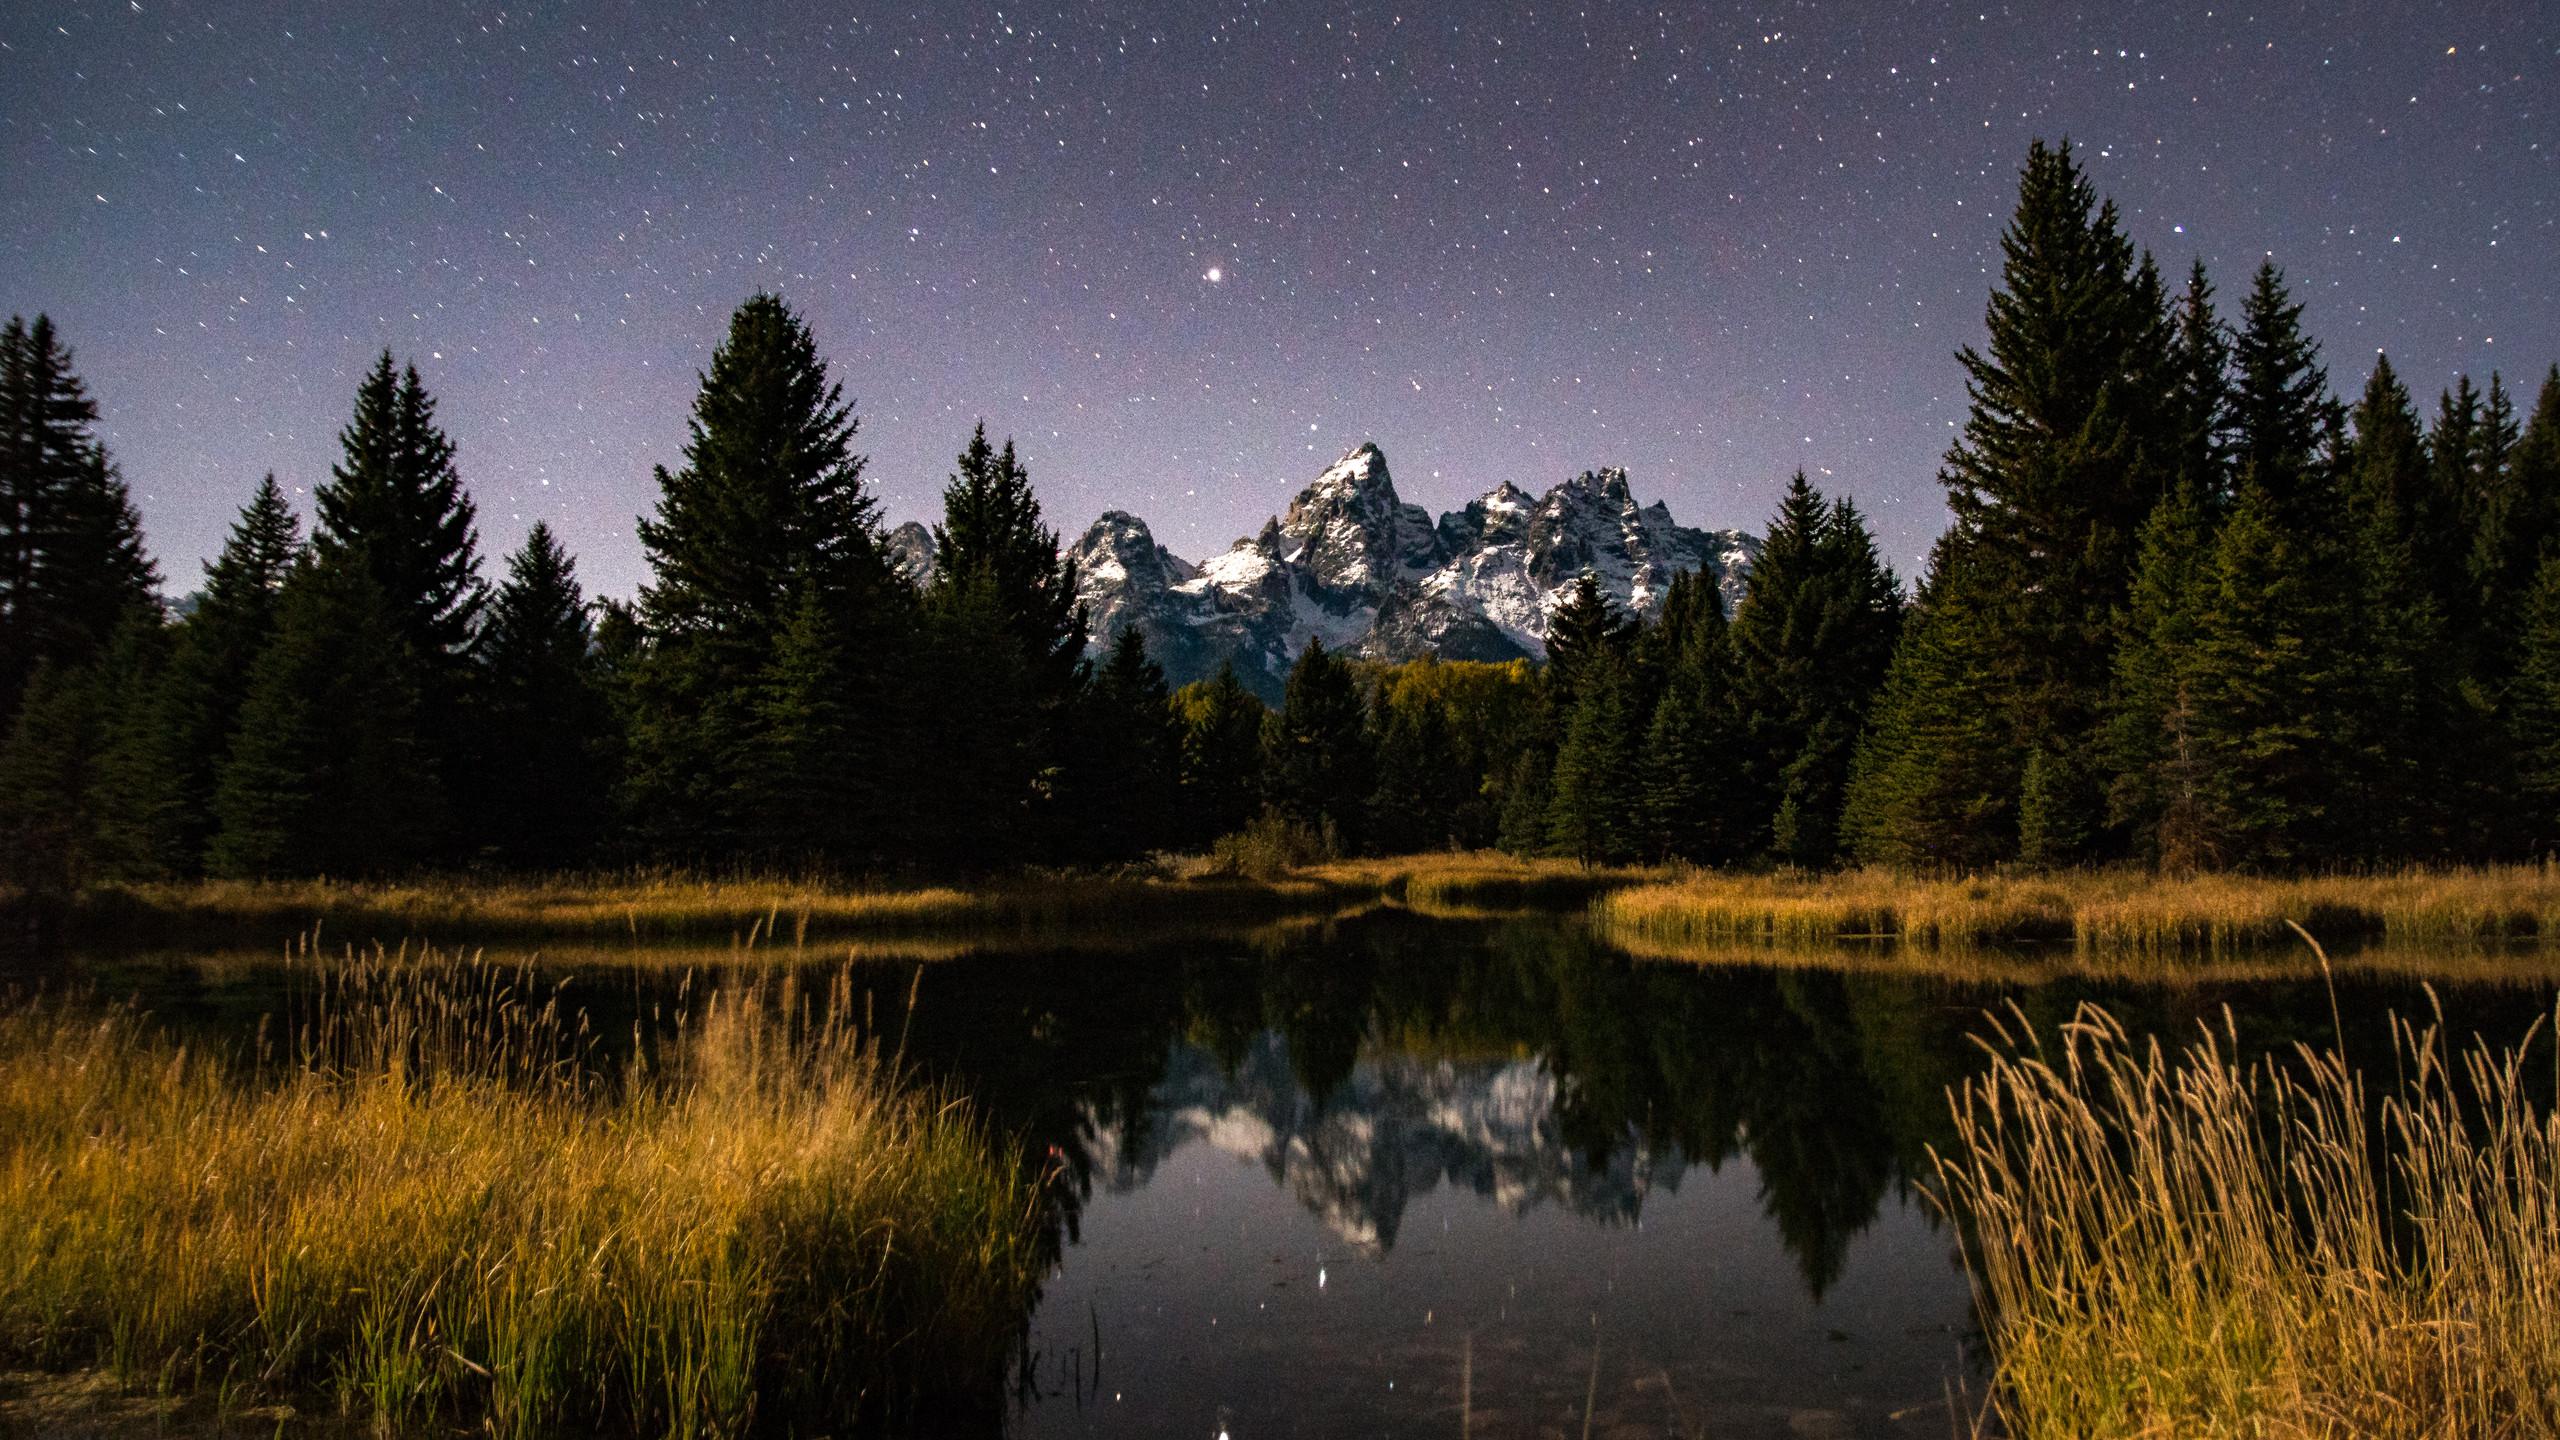 Moonlit Night at Schwabacher Landing